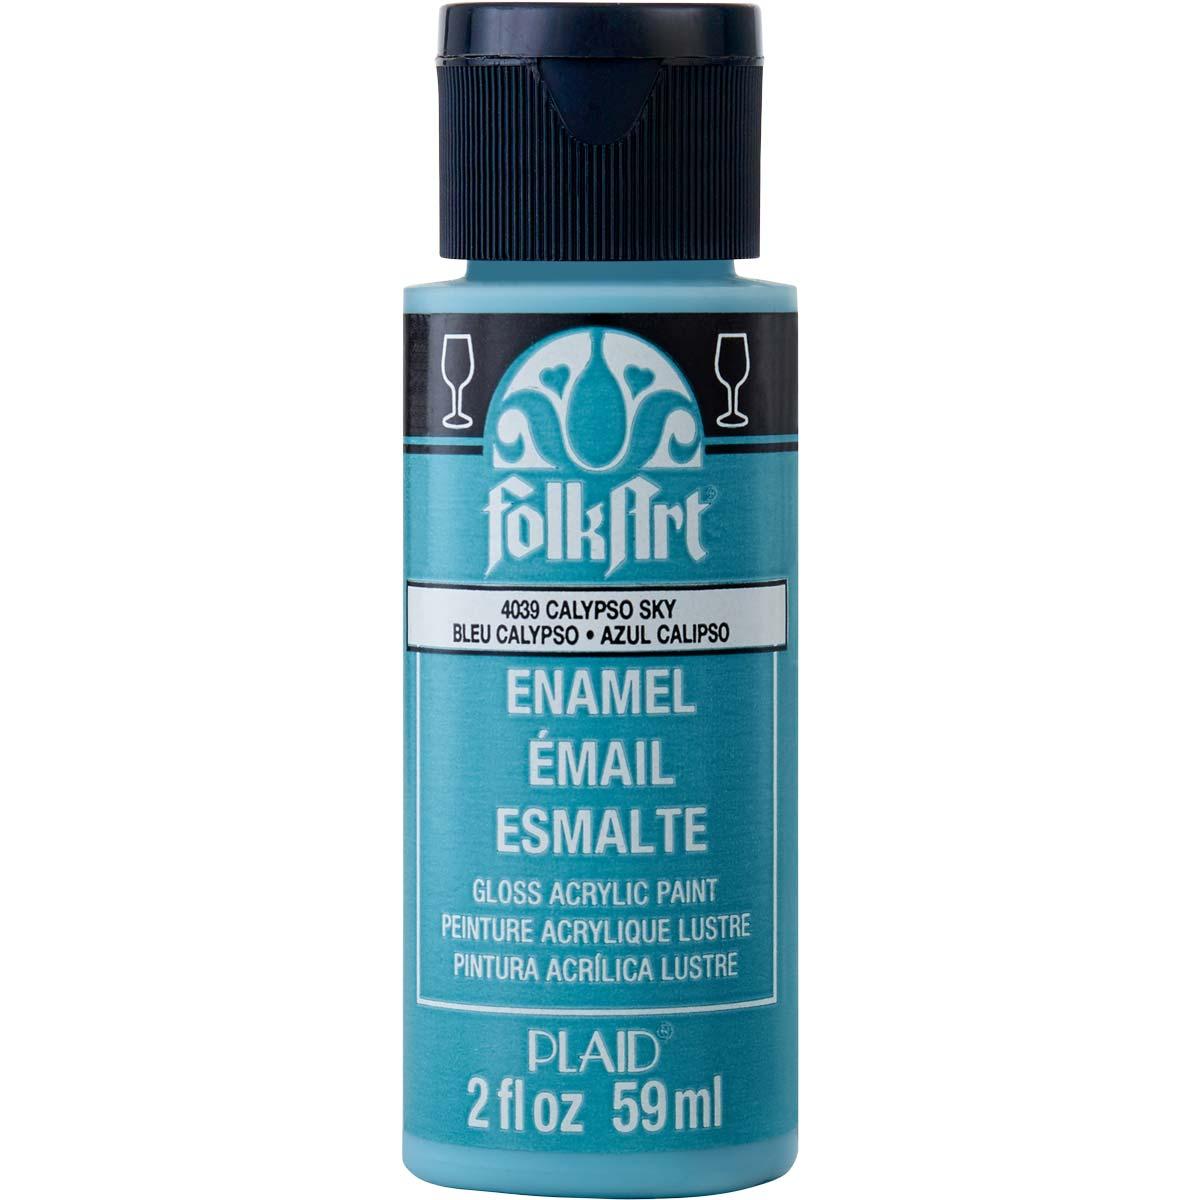 FolkArt ® Enamels™ - Calypso Sky, 2 oz. - 4039